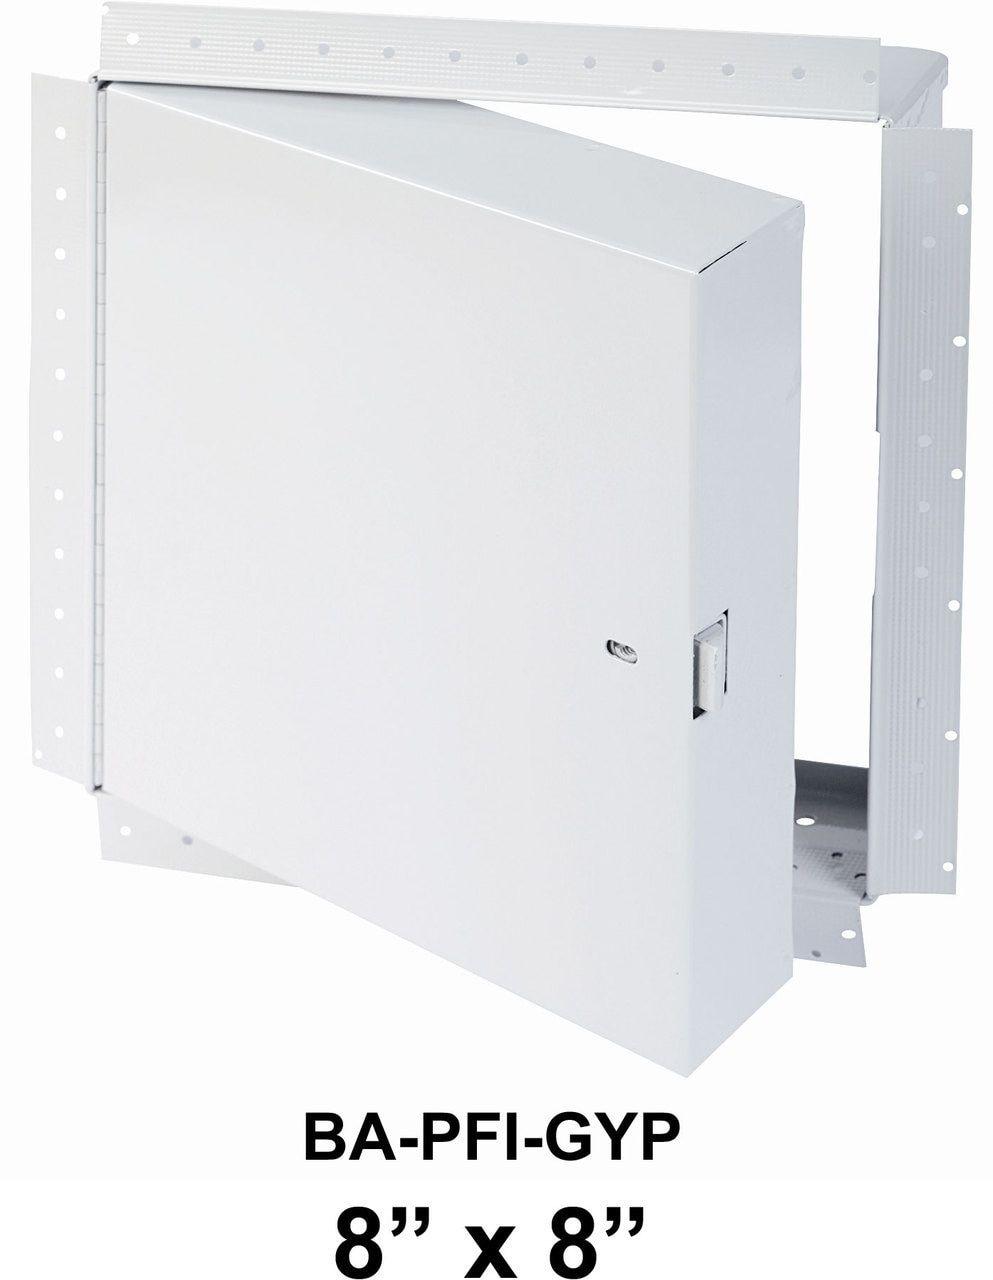 Pin On Ceiling Attic Access Doors